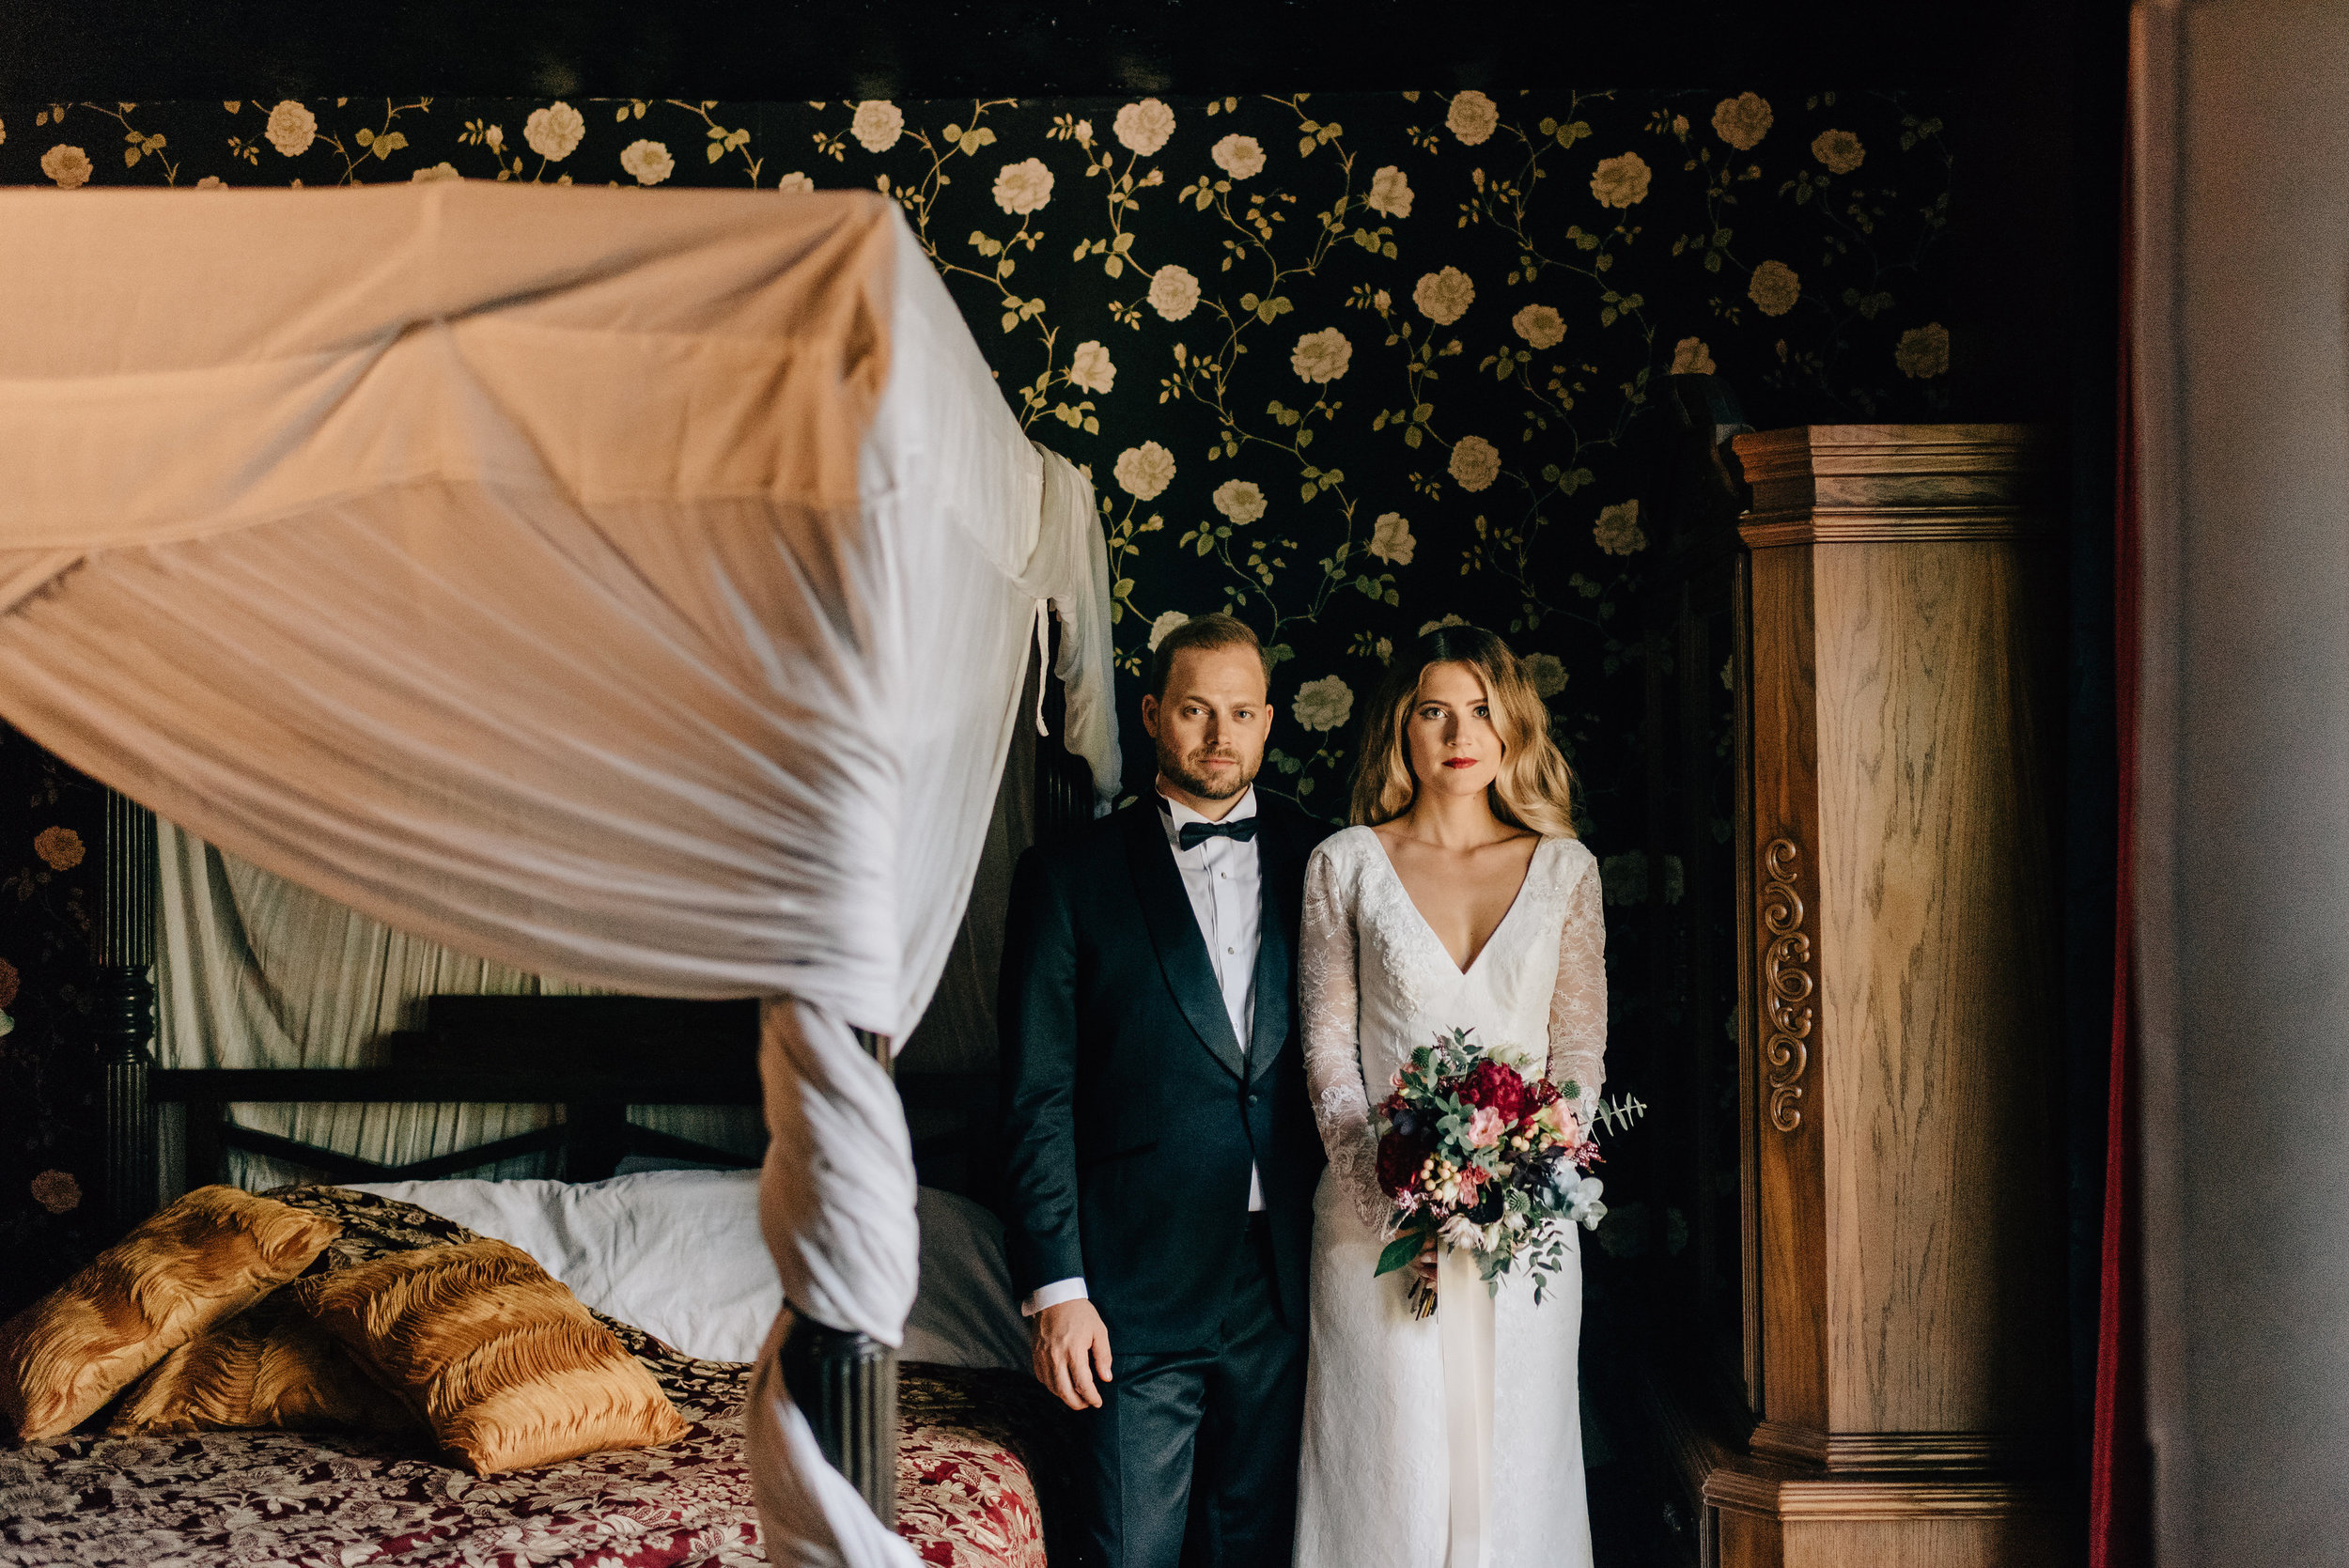 Candice-James-Wedding-438.jpg